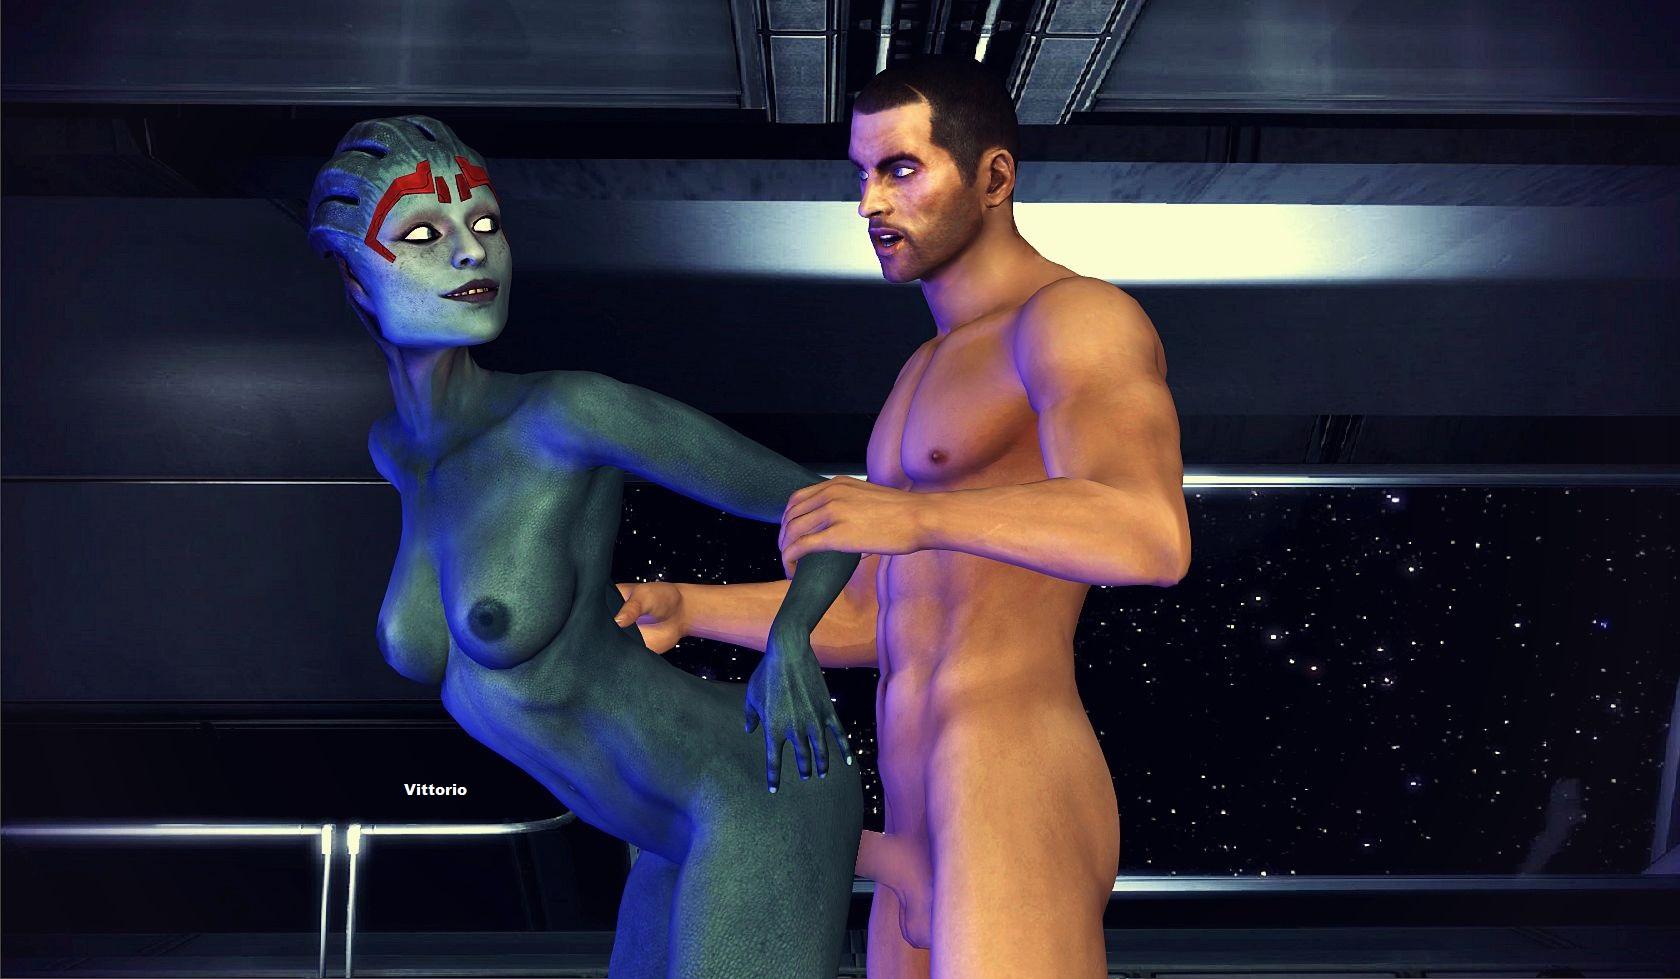 Секс знакомства самара бесплатно онлайн 24 фотография